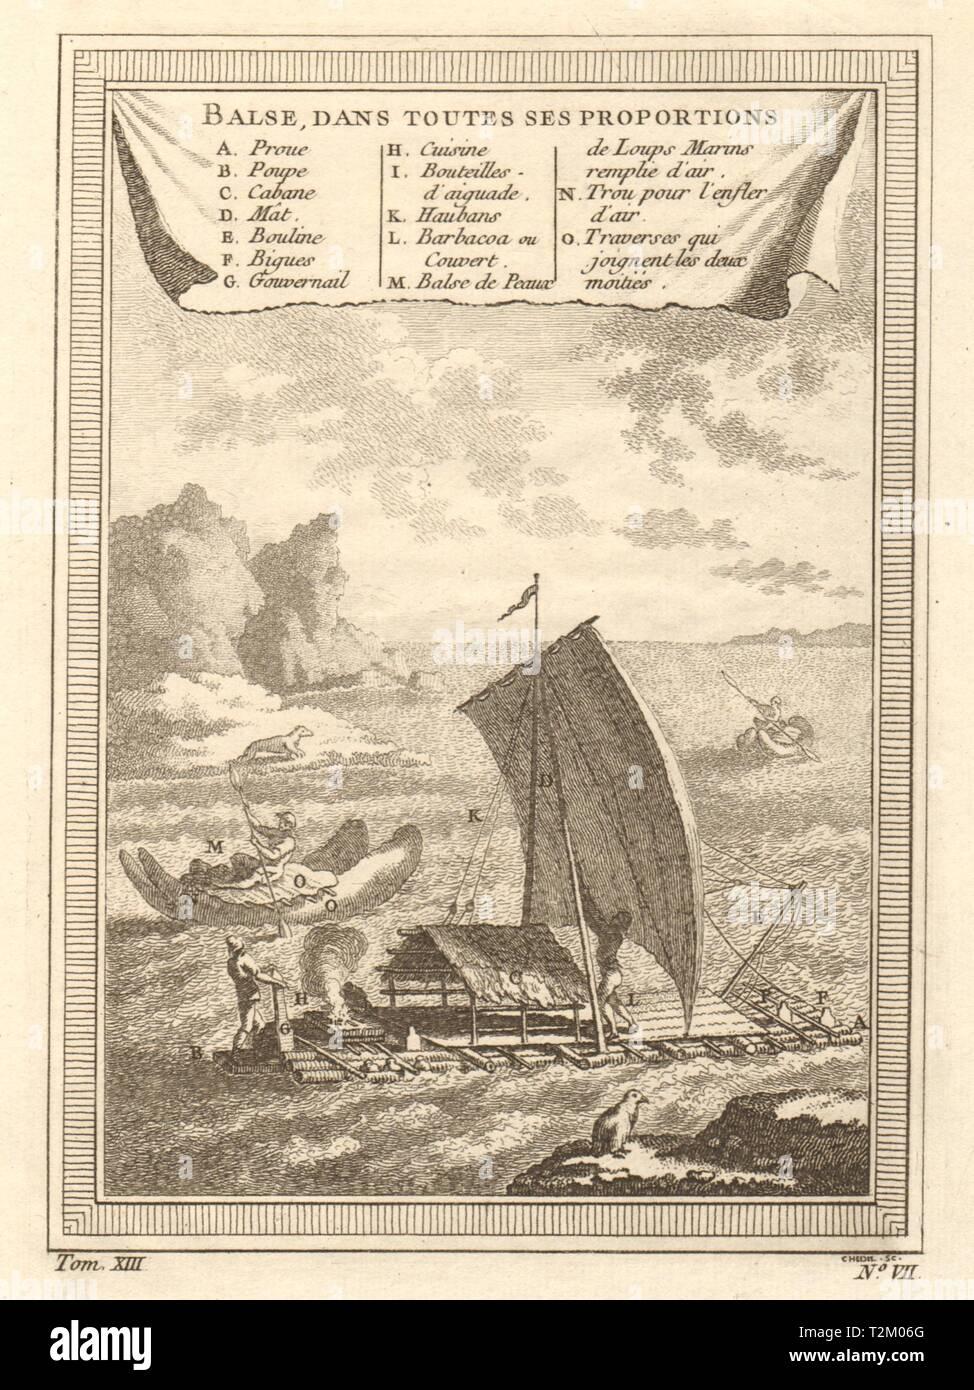 'Balse, dans toutes ses proportions'. Types of Peruvian pre-Columbian rafts 1756 - Stock Image